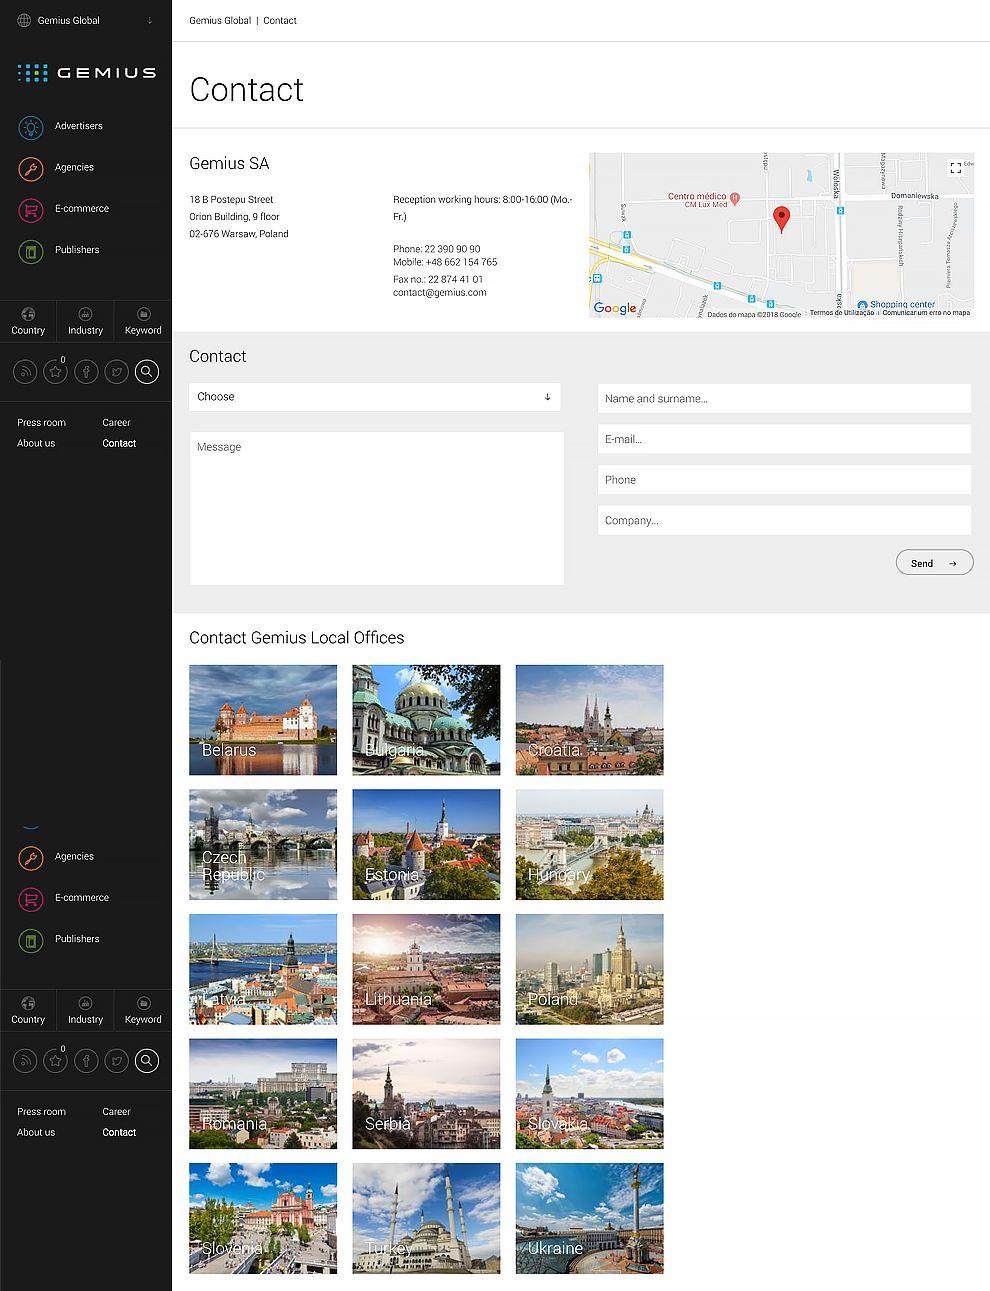 Gemius Top Website Design Contact Page